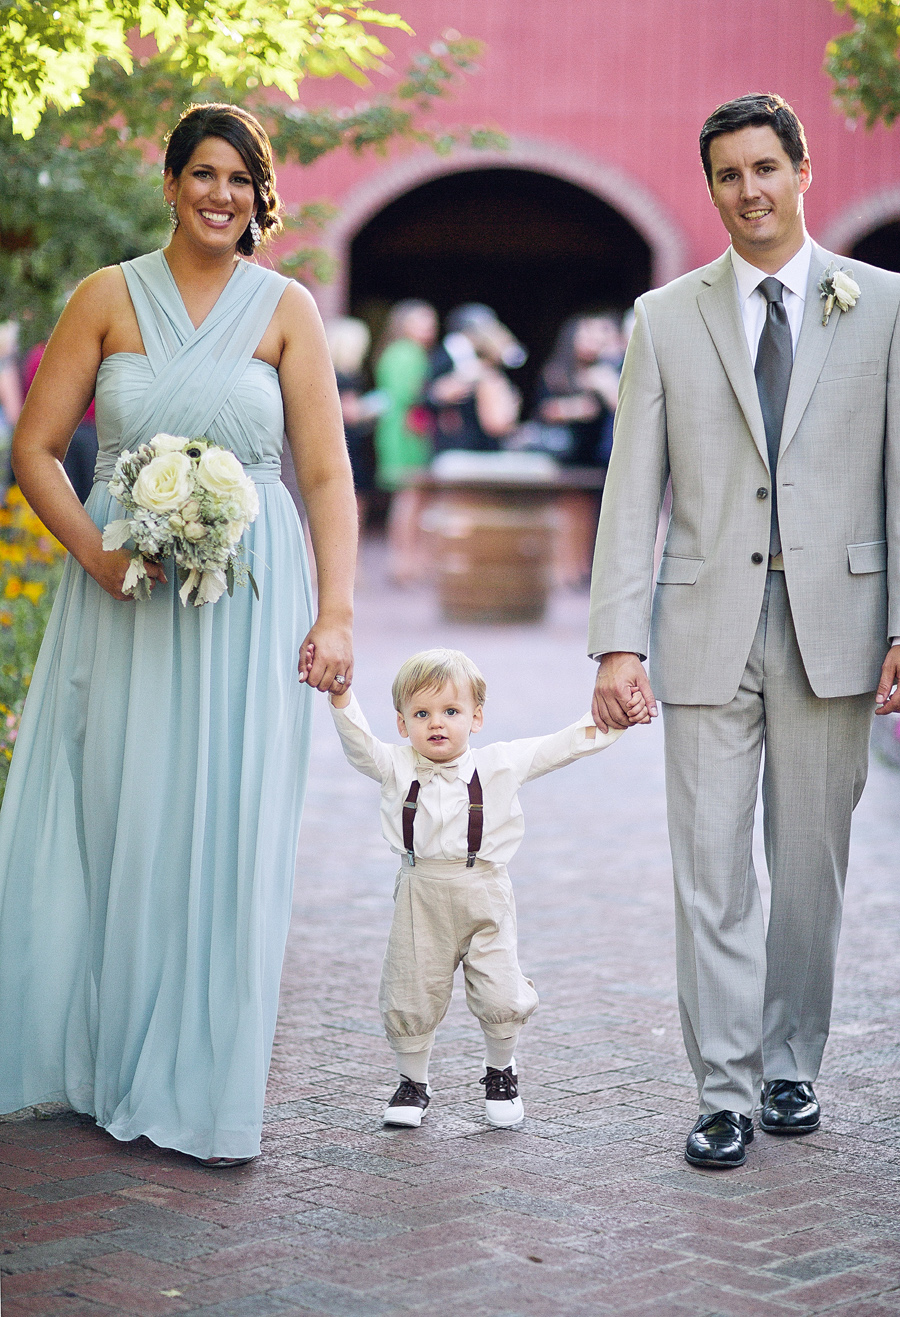 Emily_Todd_LarkspurColorado_Wedding_16.jpg